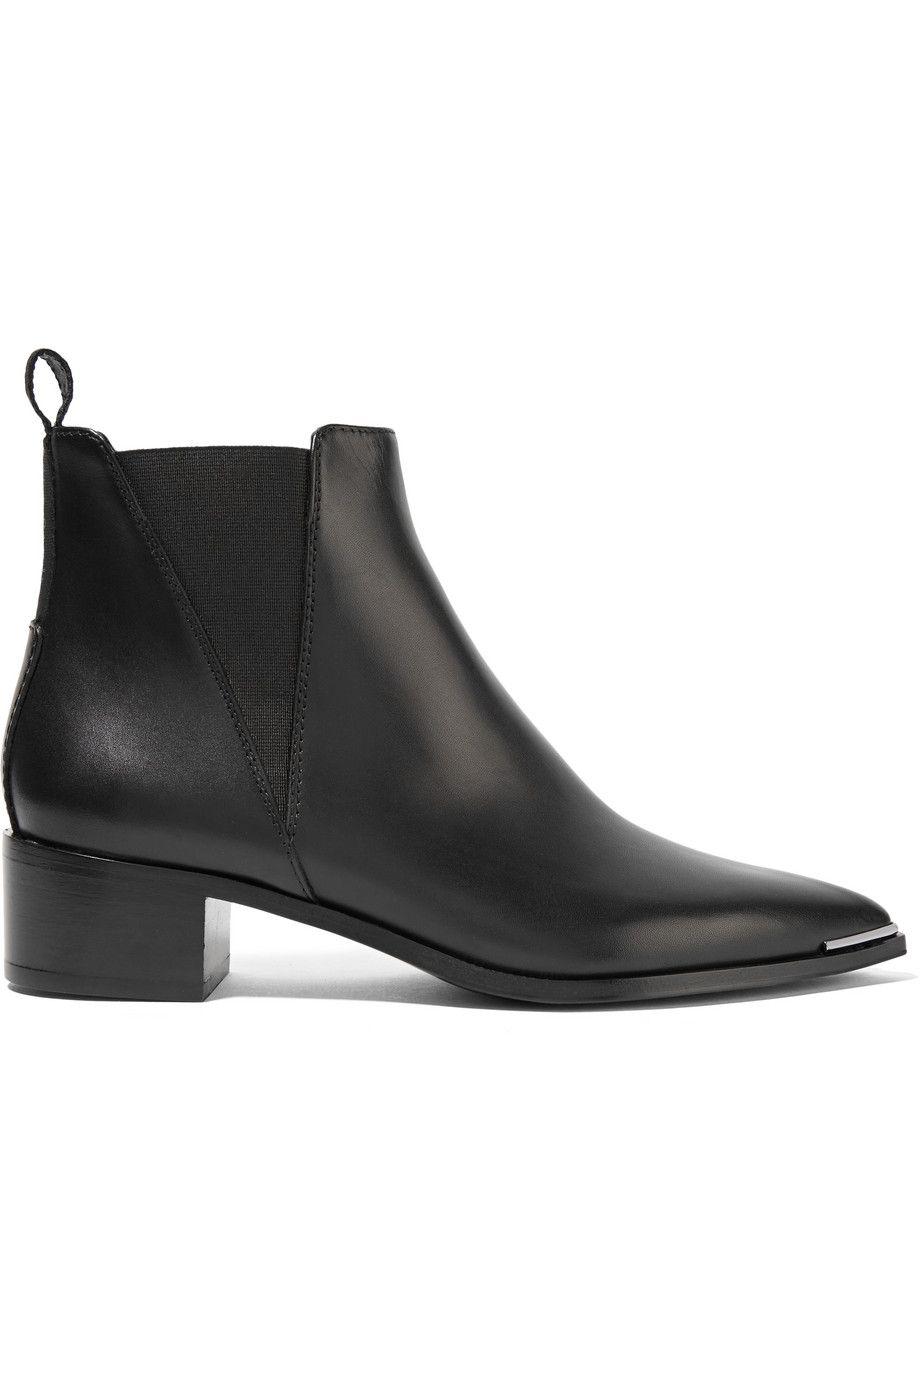 #PopbelaOOTD: Boots Bergaya Klasik yang Cocok jadi Investasi